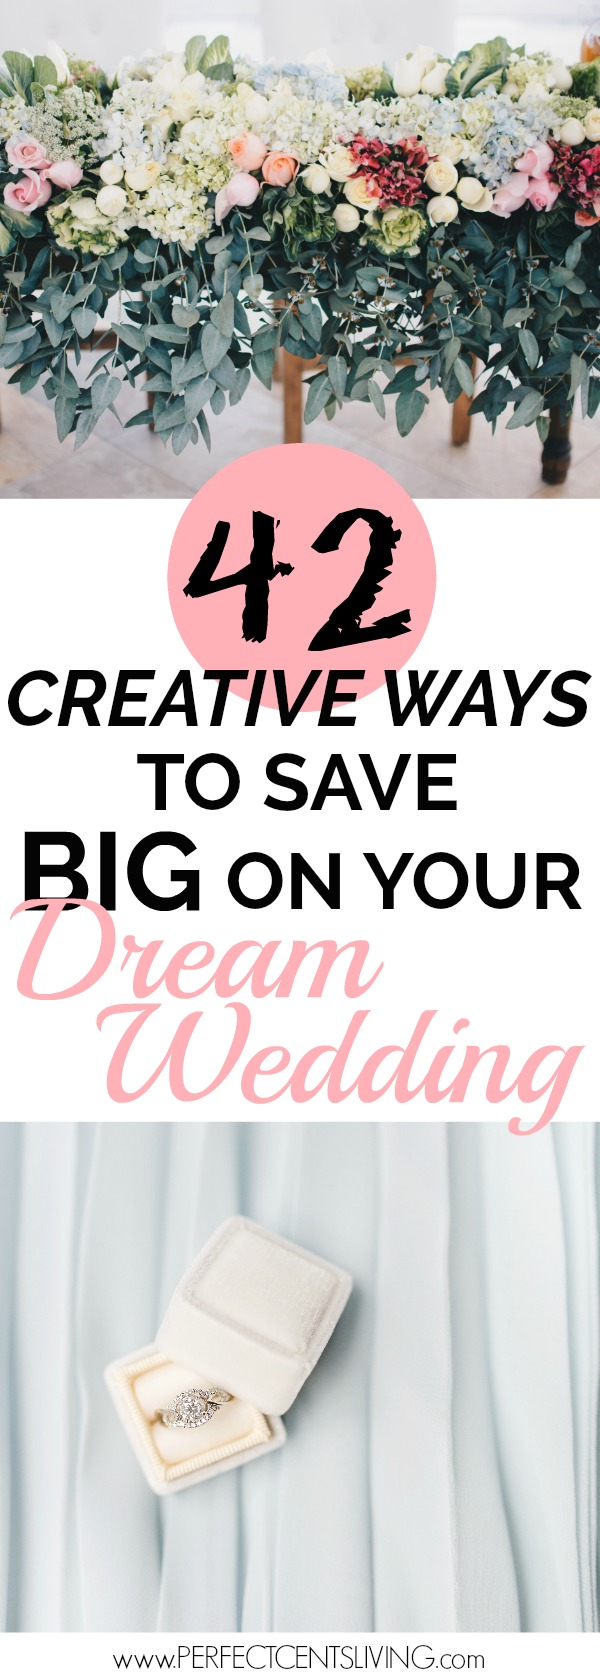 42 creative ways to save big on your dream wedding. Black Bedroom Furniture Sets. Home Design Ideas